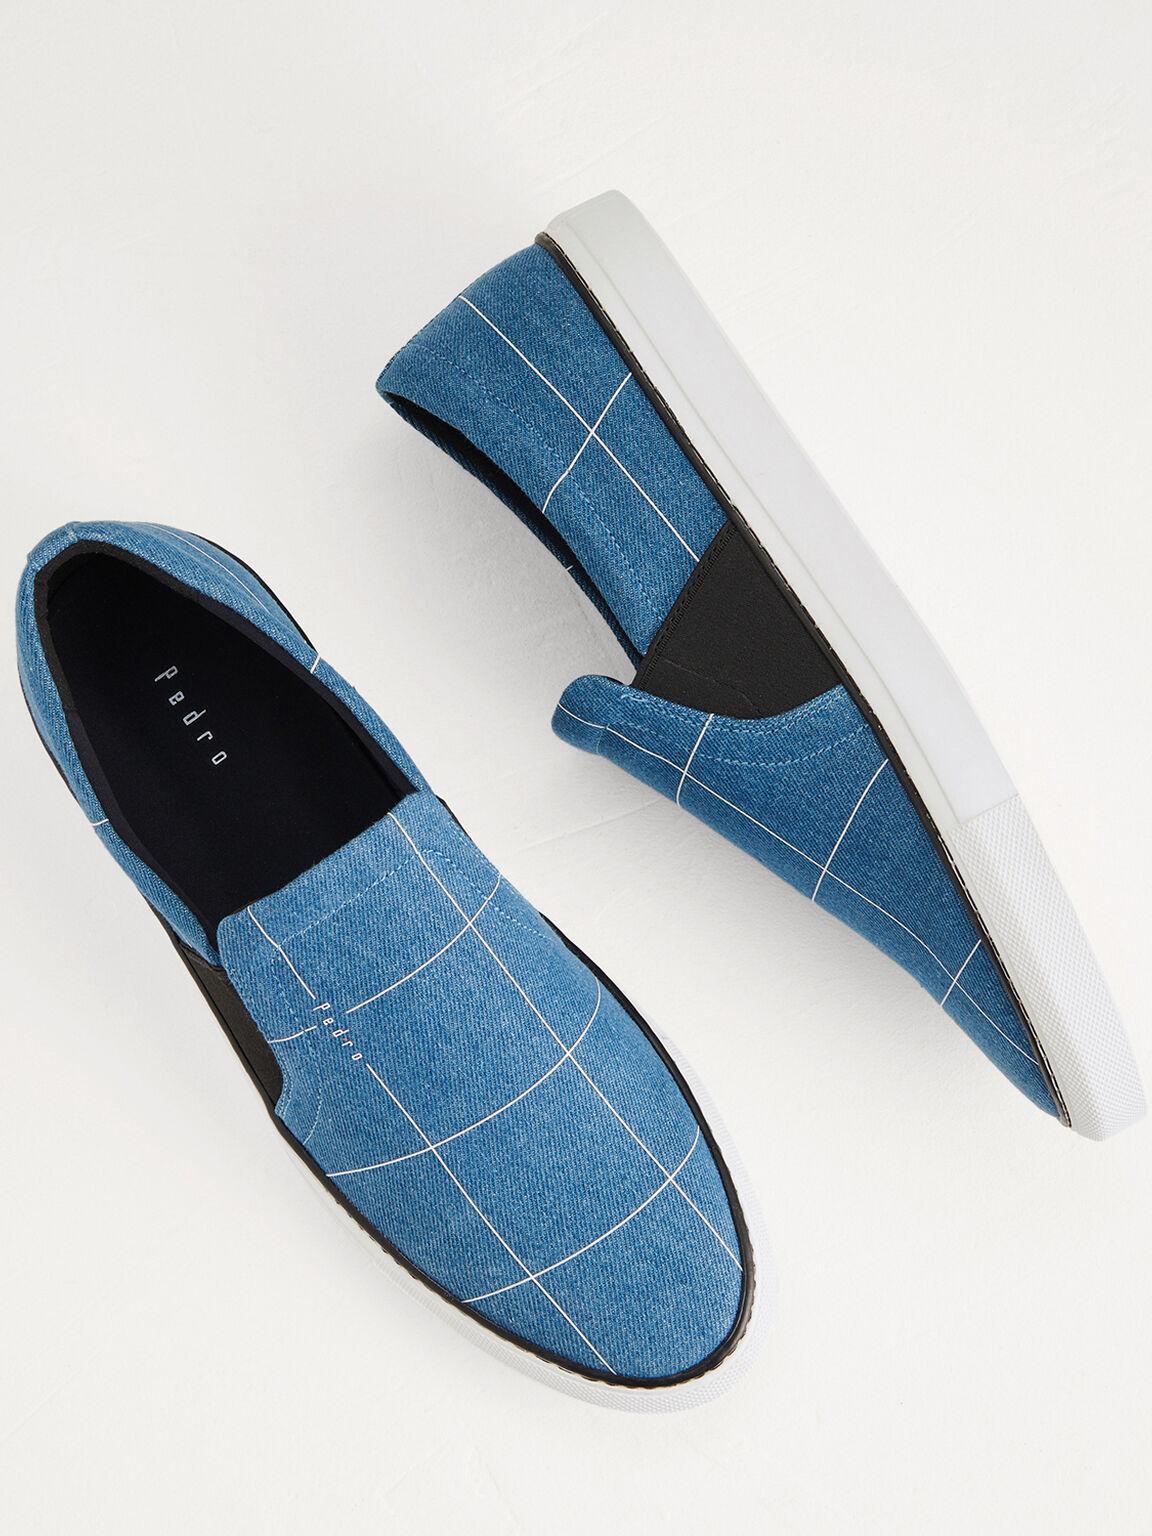 Denim Pane Checks Slip On Shoes, Blue, hi-res